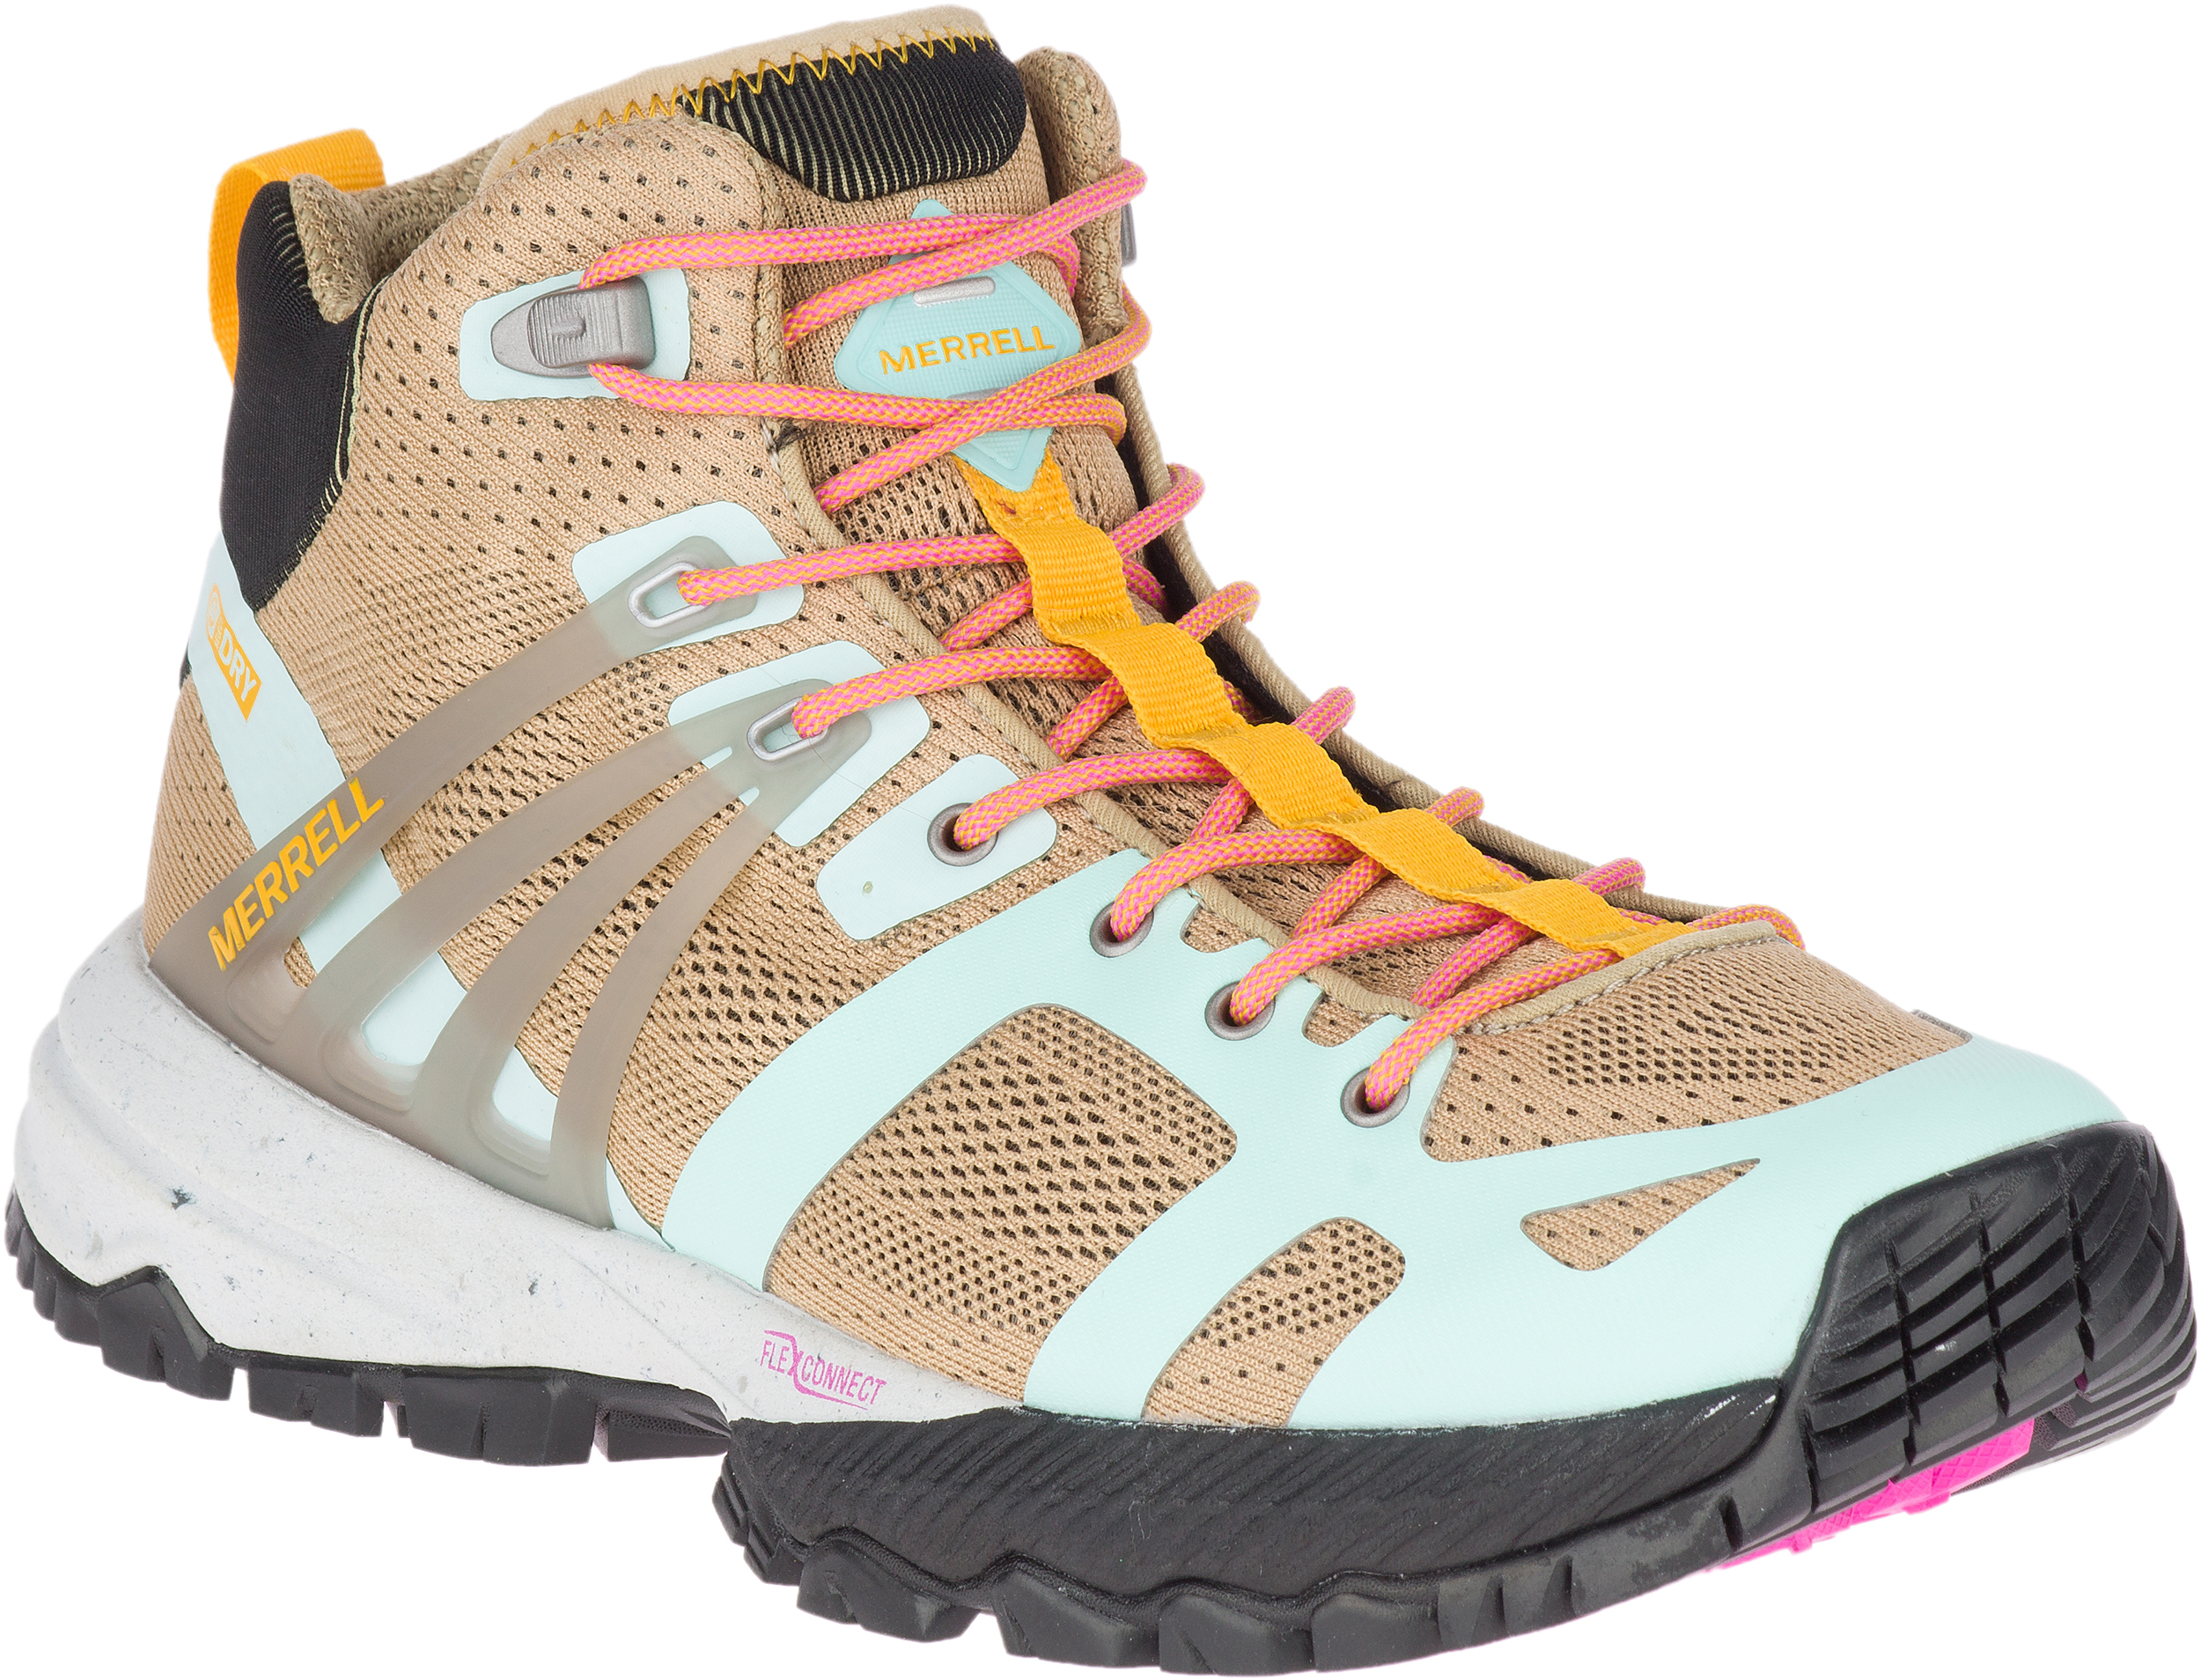 a237485e685 Hiking boots | MEC